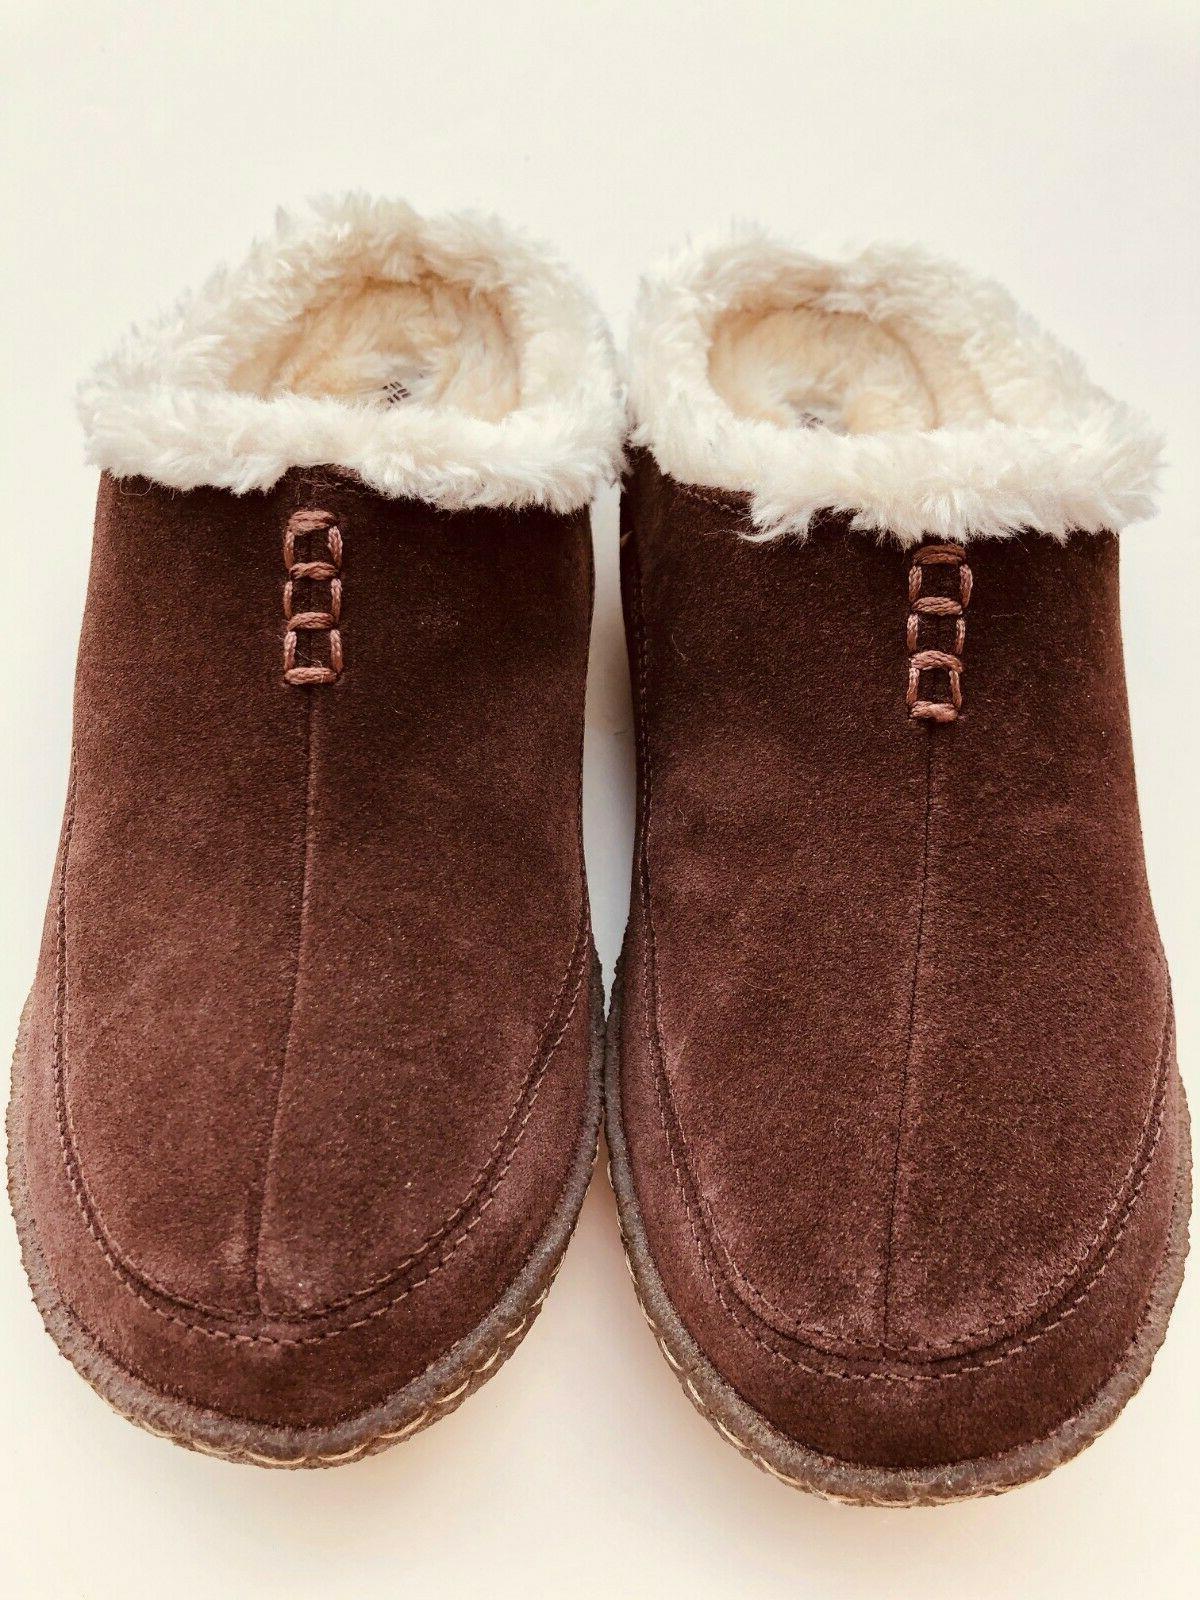 EUC Suede Slippers Size 7 US/ UK